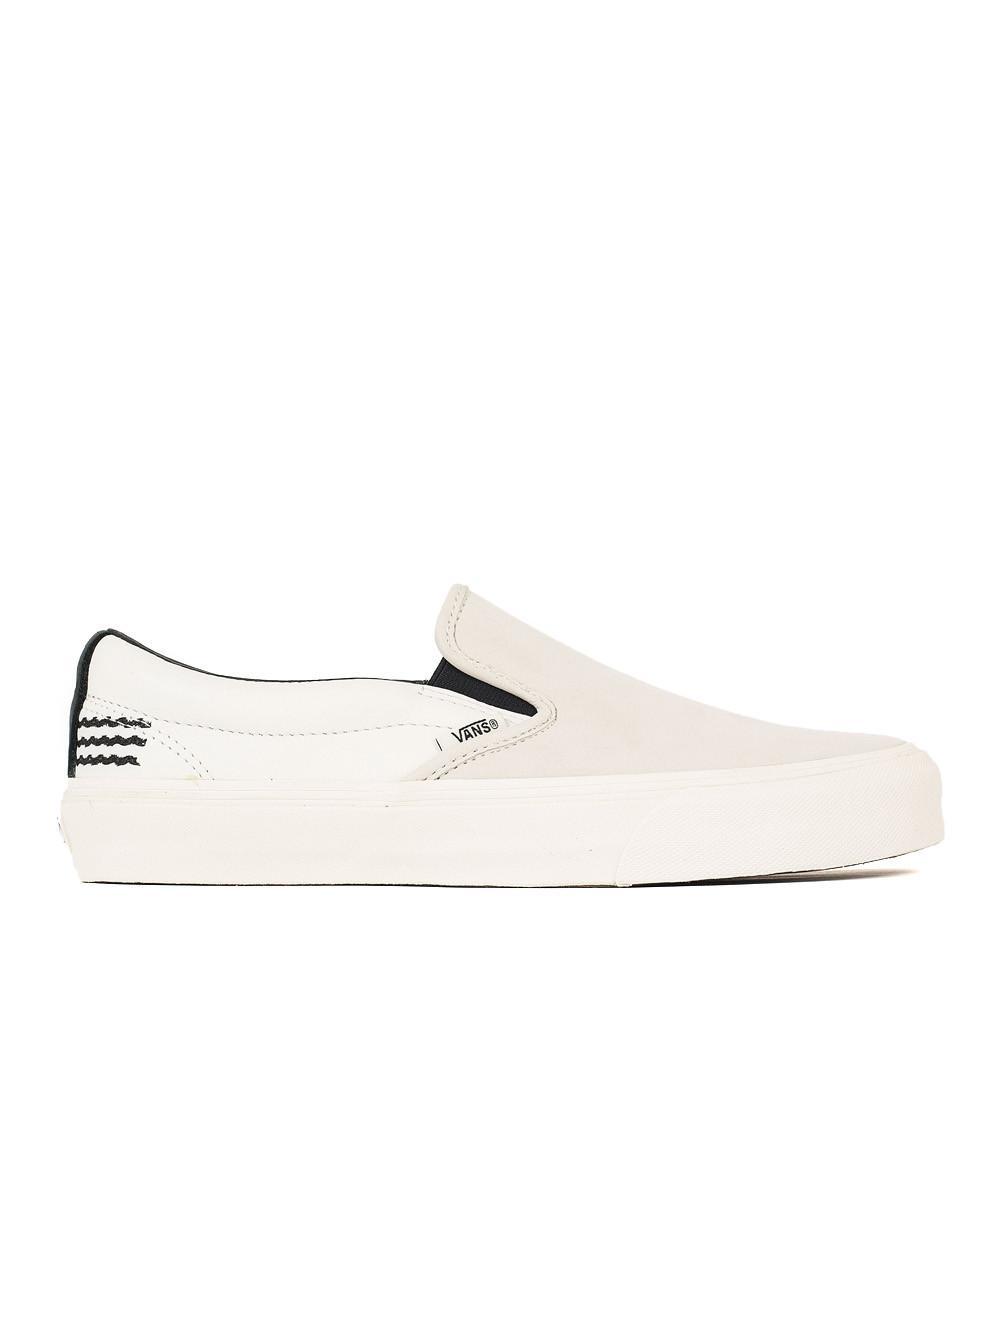 4e97d2c7d66475 Vans X Taka Hayashi Slip On 66 Lx Sneakers